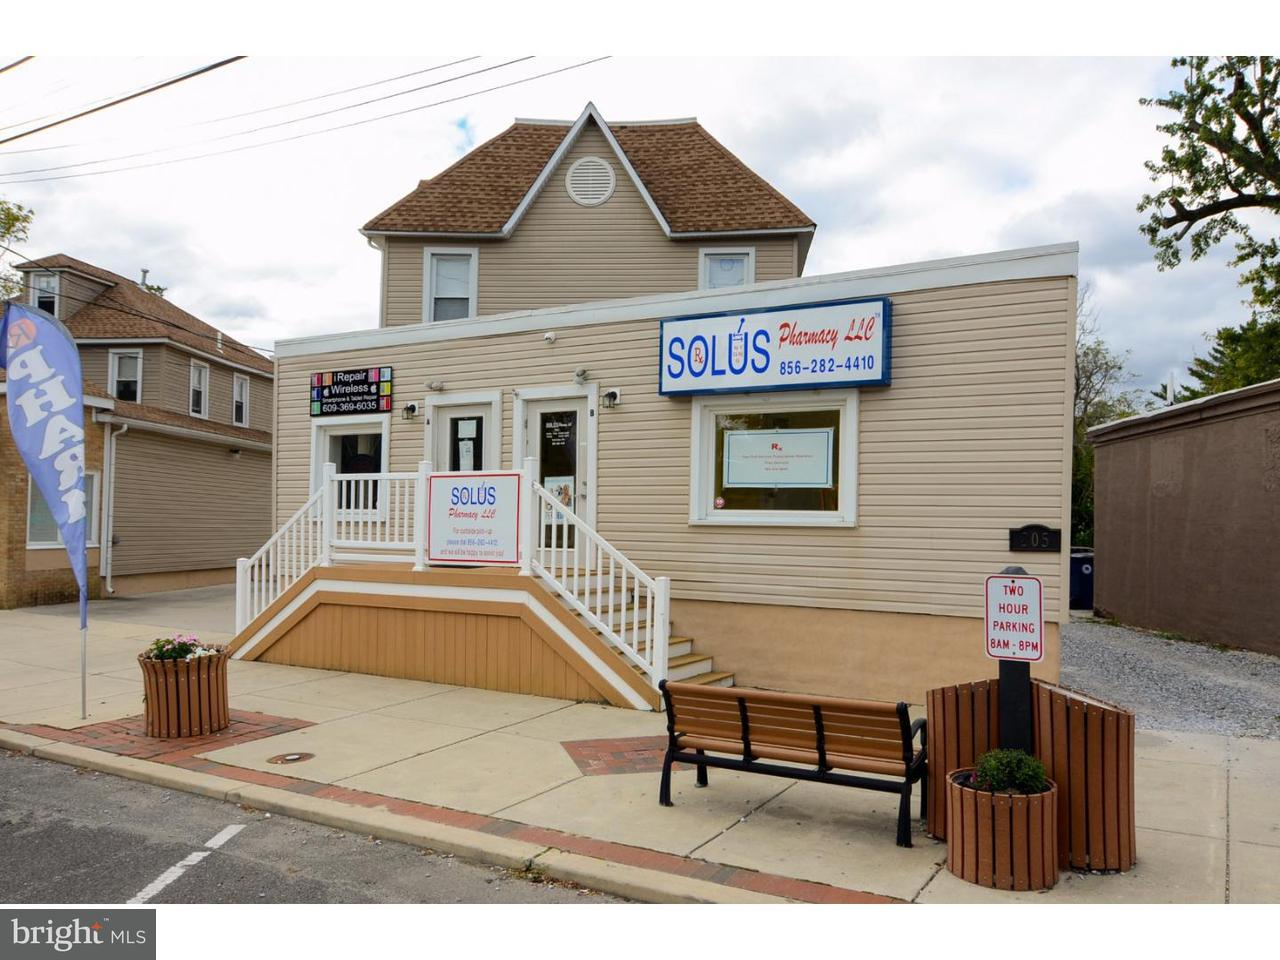 独户住宅 为 销售 在 805 W ATLANTIC Avenue Laurel Springs, 新泽西州 08021 美国